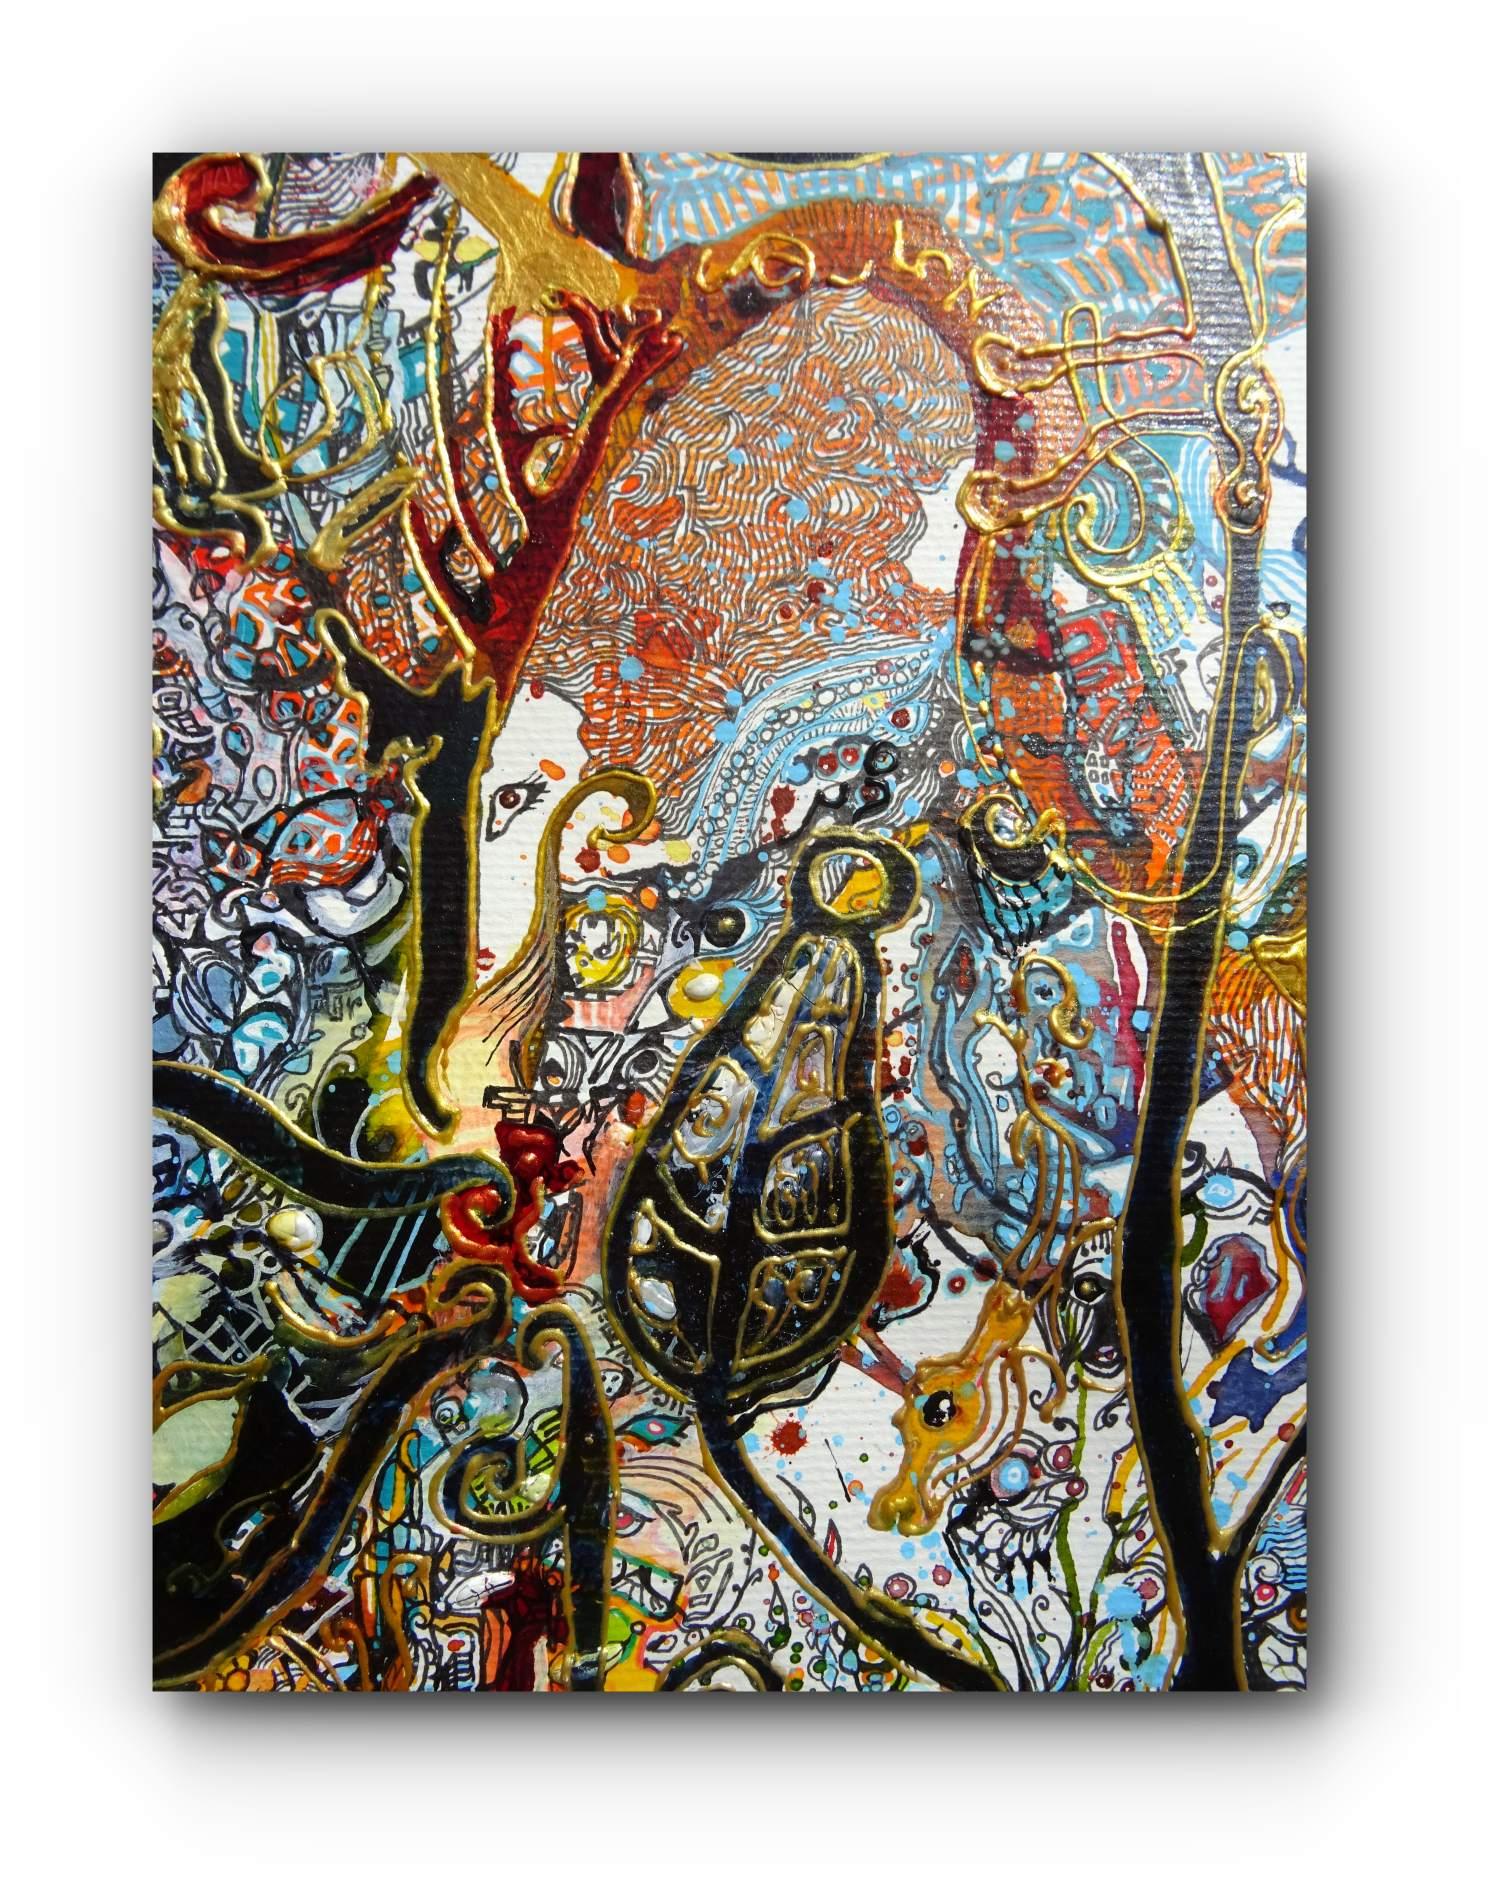 painting-hanging-gardens-d1-artist-duo-ingress-vortices.jpg